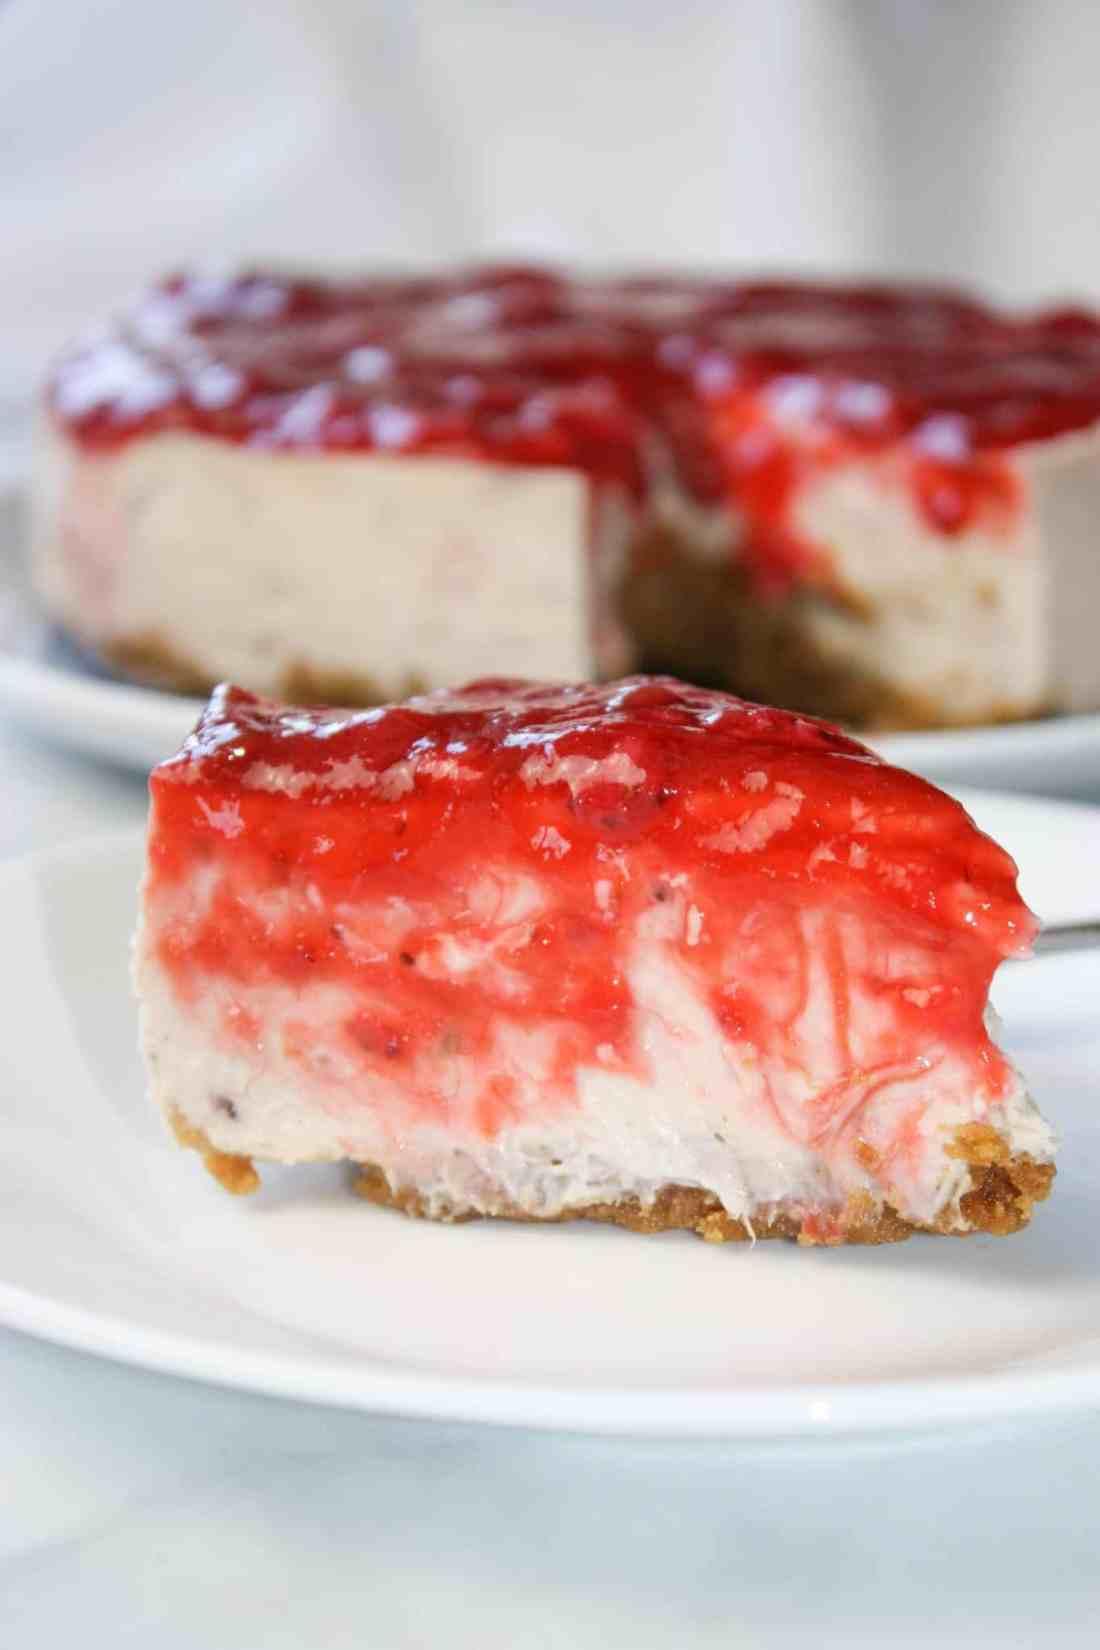 Instant Pot Strawberry Rhubarb Cheesecake is a delightful, decadent dessert using seasonal ingredients.